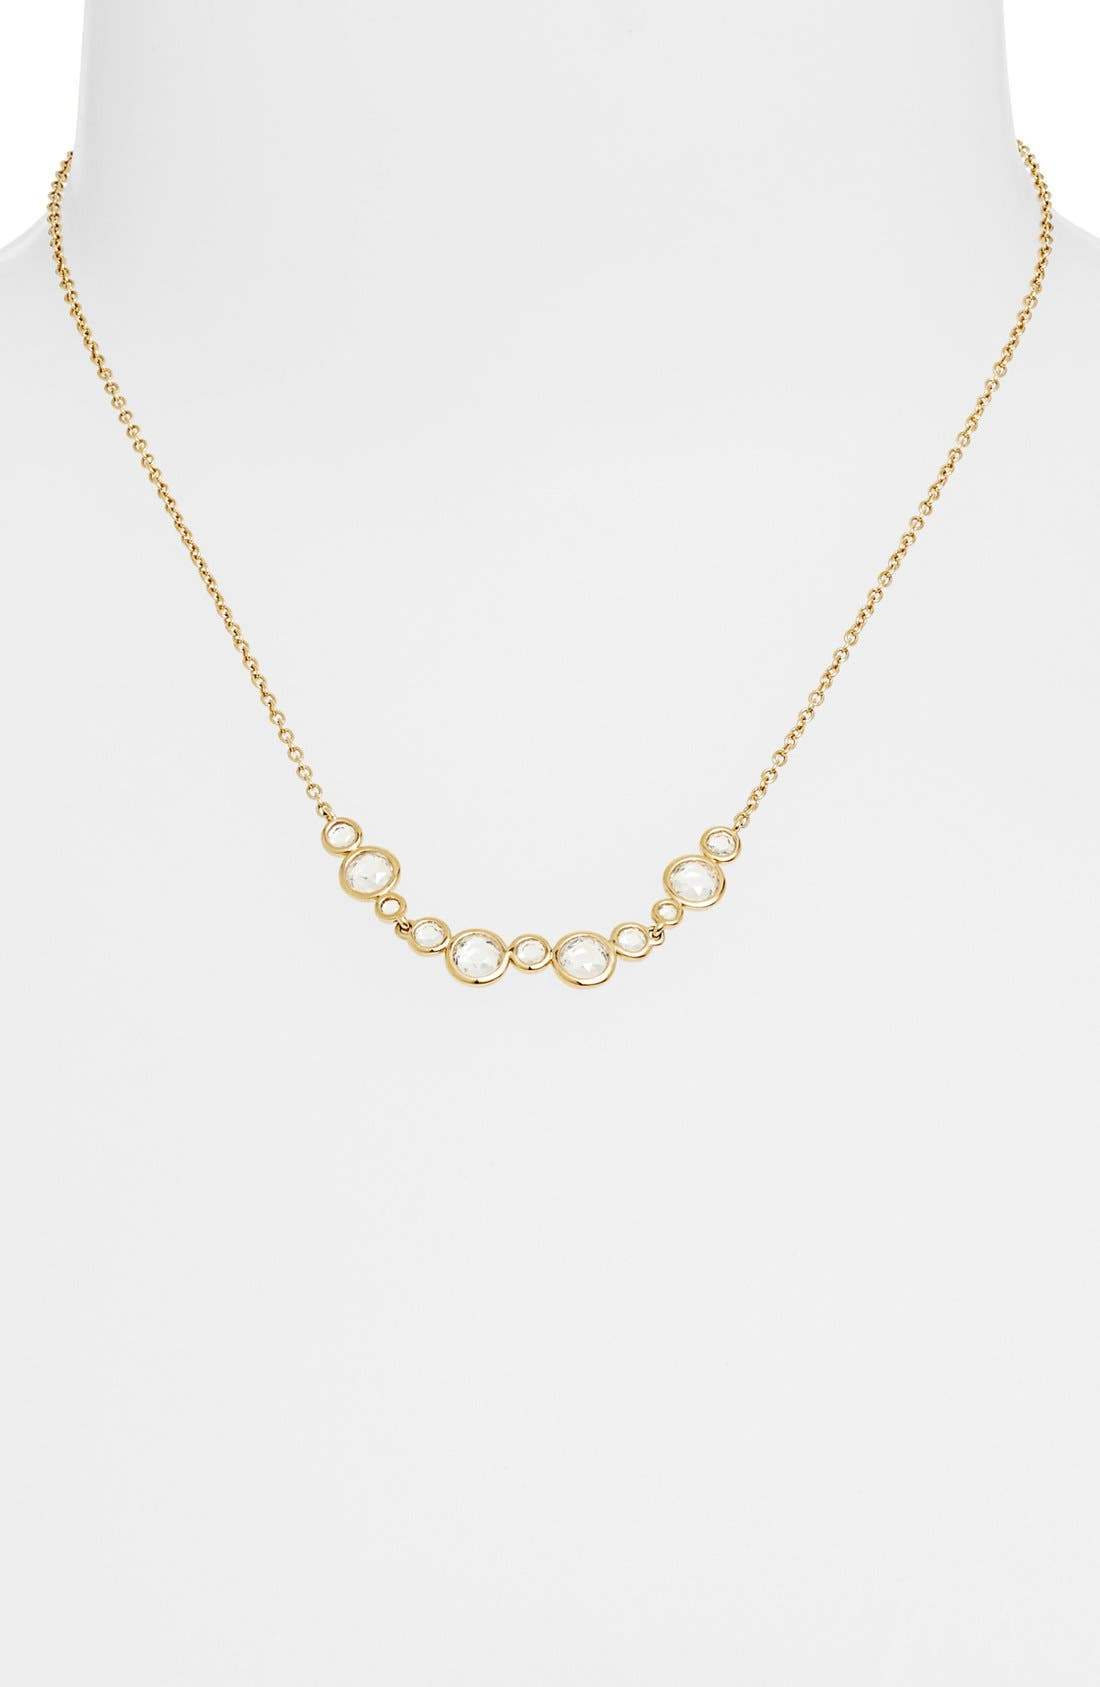 Alternate Image 1 Selected - Nadri 'Dew Drop' Frontal Necklace